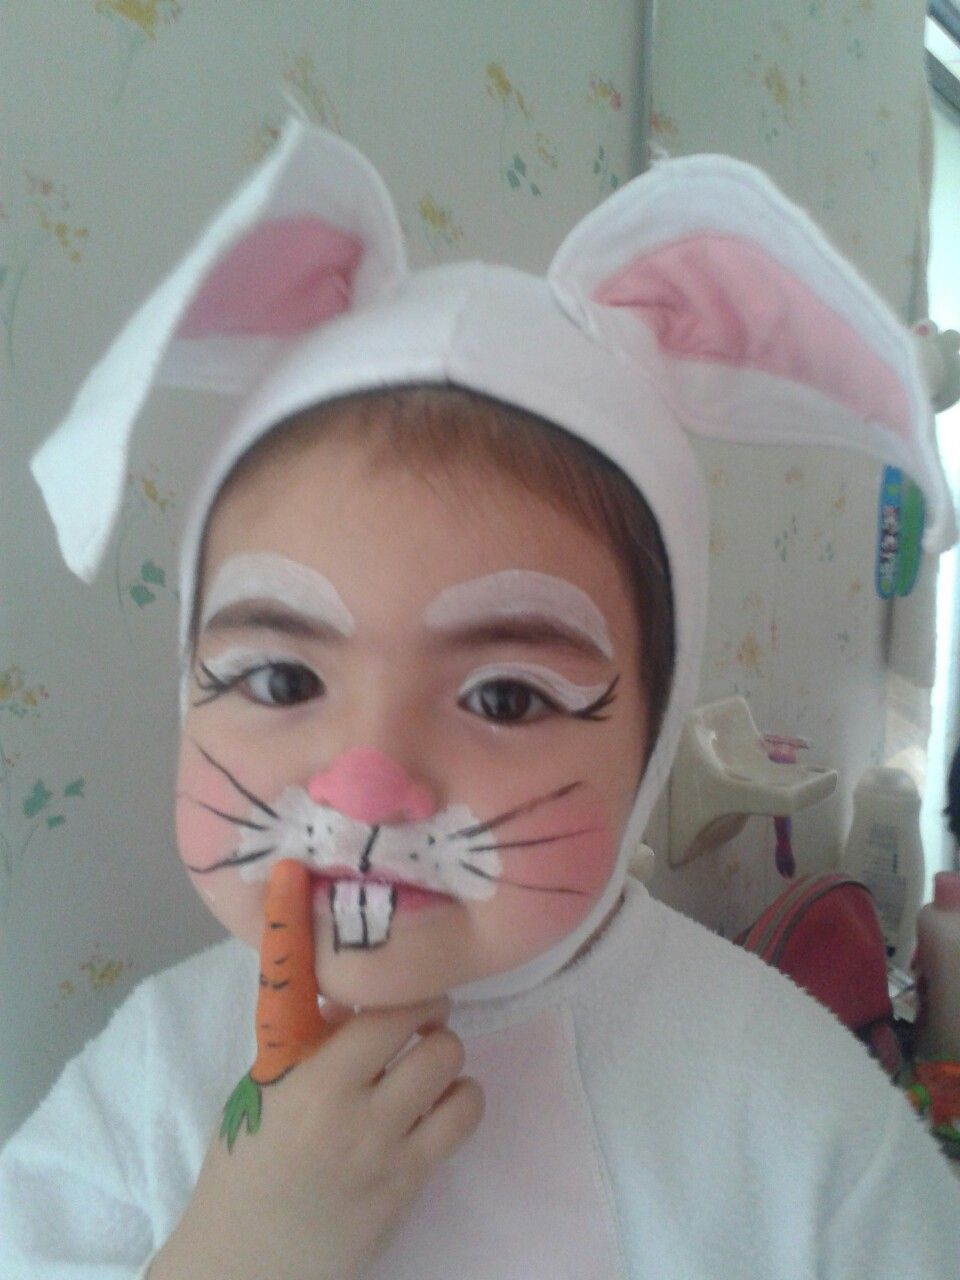 1ae5a1687 Facepaint bunny - conejito Maquillaje Disfraz, Disfraz Elsa, Maquillaje  Halloween Niños, Maquillaje Infantil